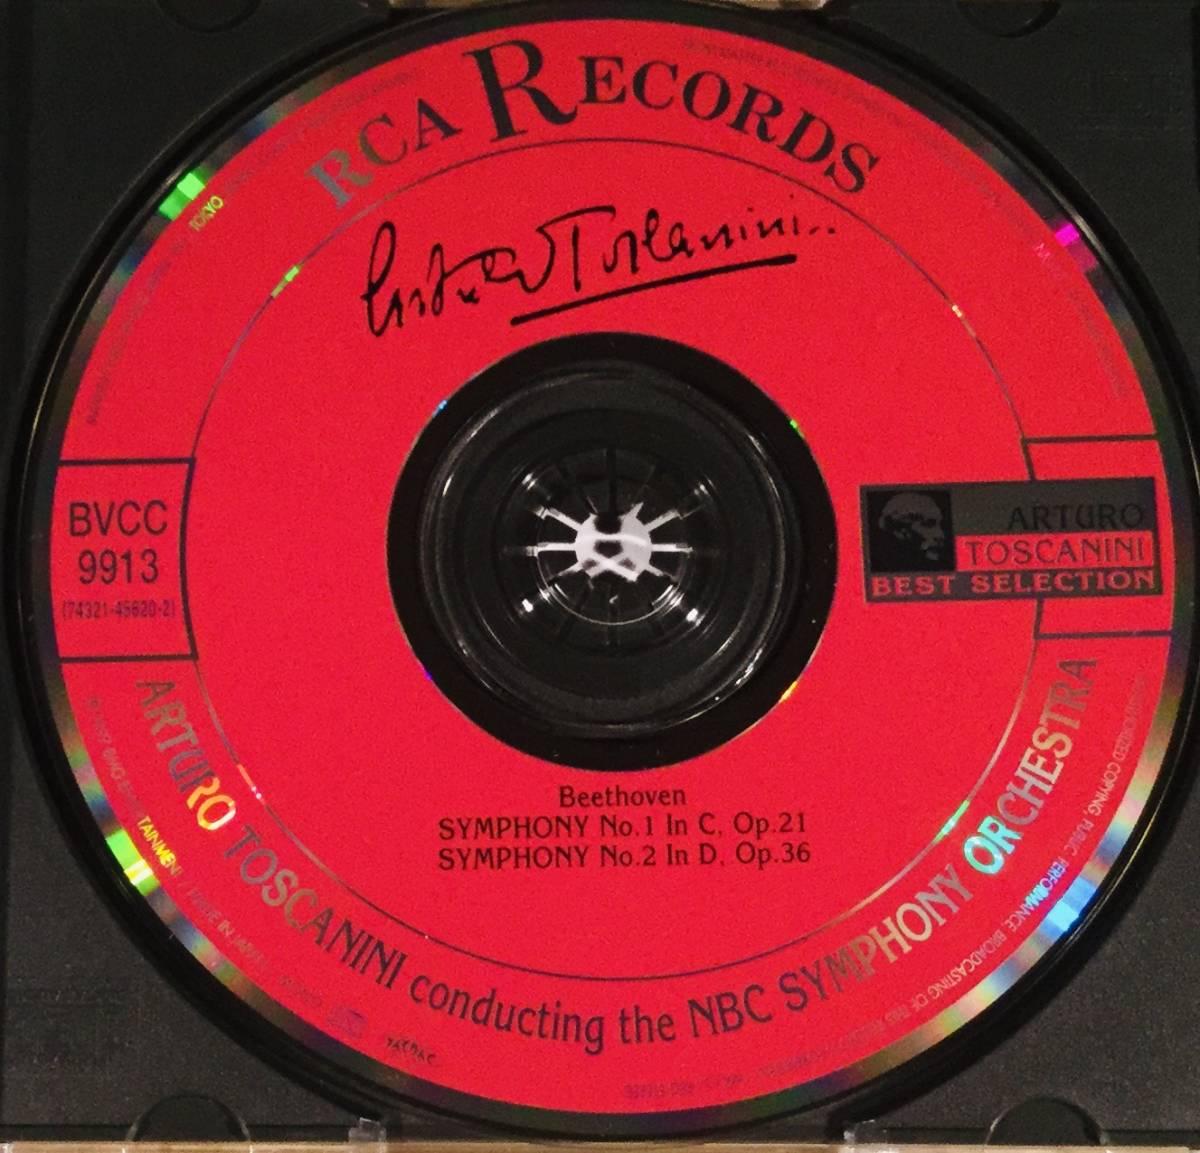 CD(完全限定盤)▲ベートーヴェン:交響曲 第1番&第2番◎アルトゥール・トスカニーニ指揮▲帯付美品!_画像4